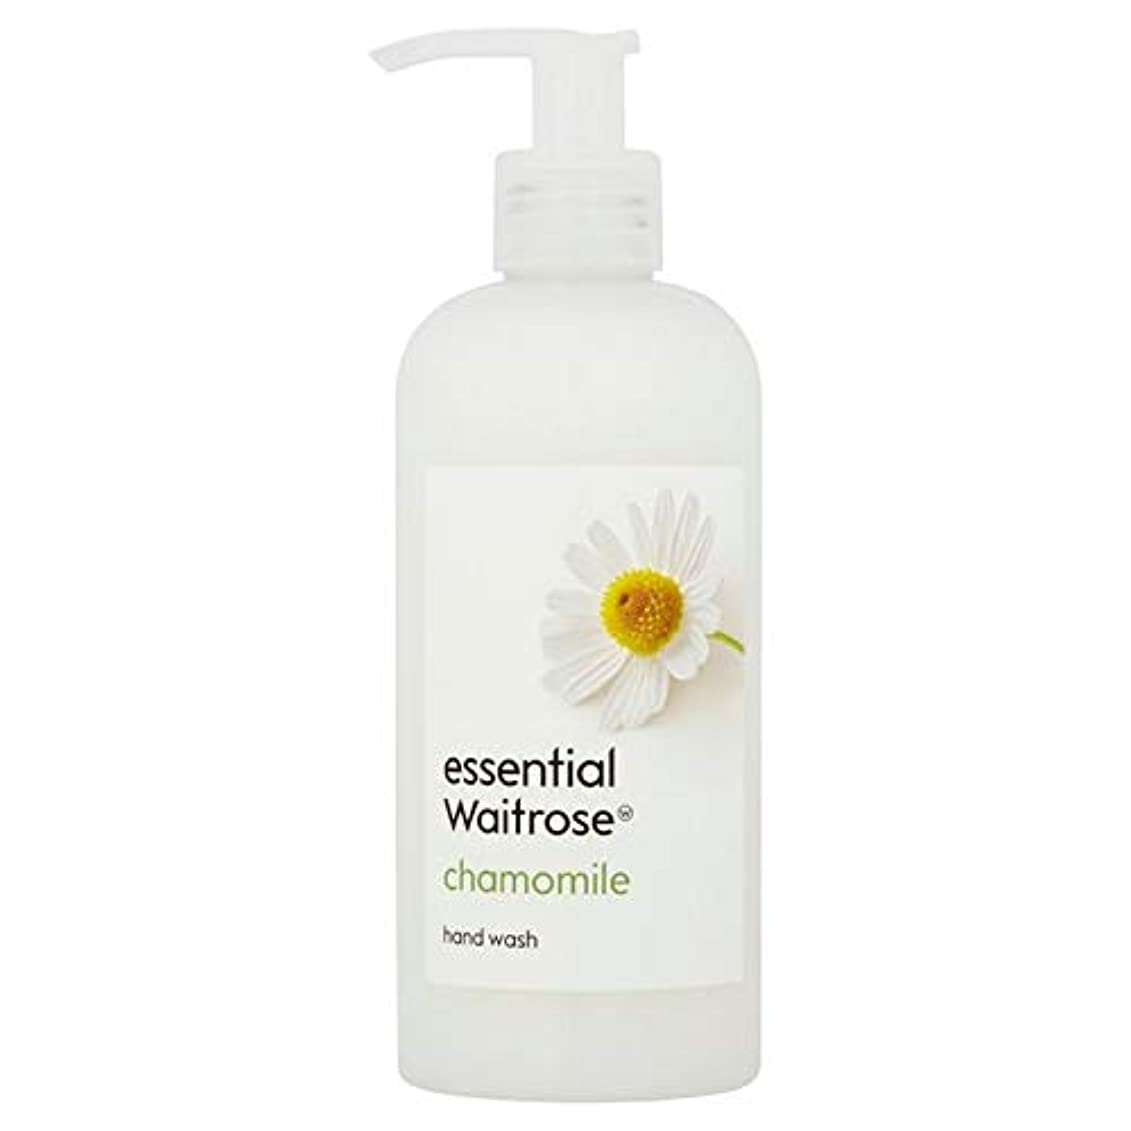 [Waitrose ] 基本的なウェイトローズのハンドウォッシュカモミール300ミリリットル - Essential Waitrose Hand Wash Chamomile 300ml [並行輸入品]